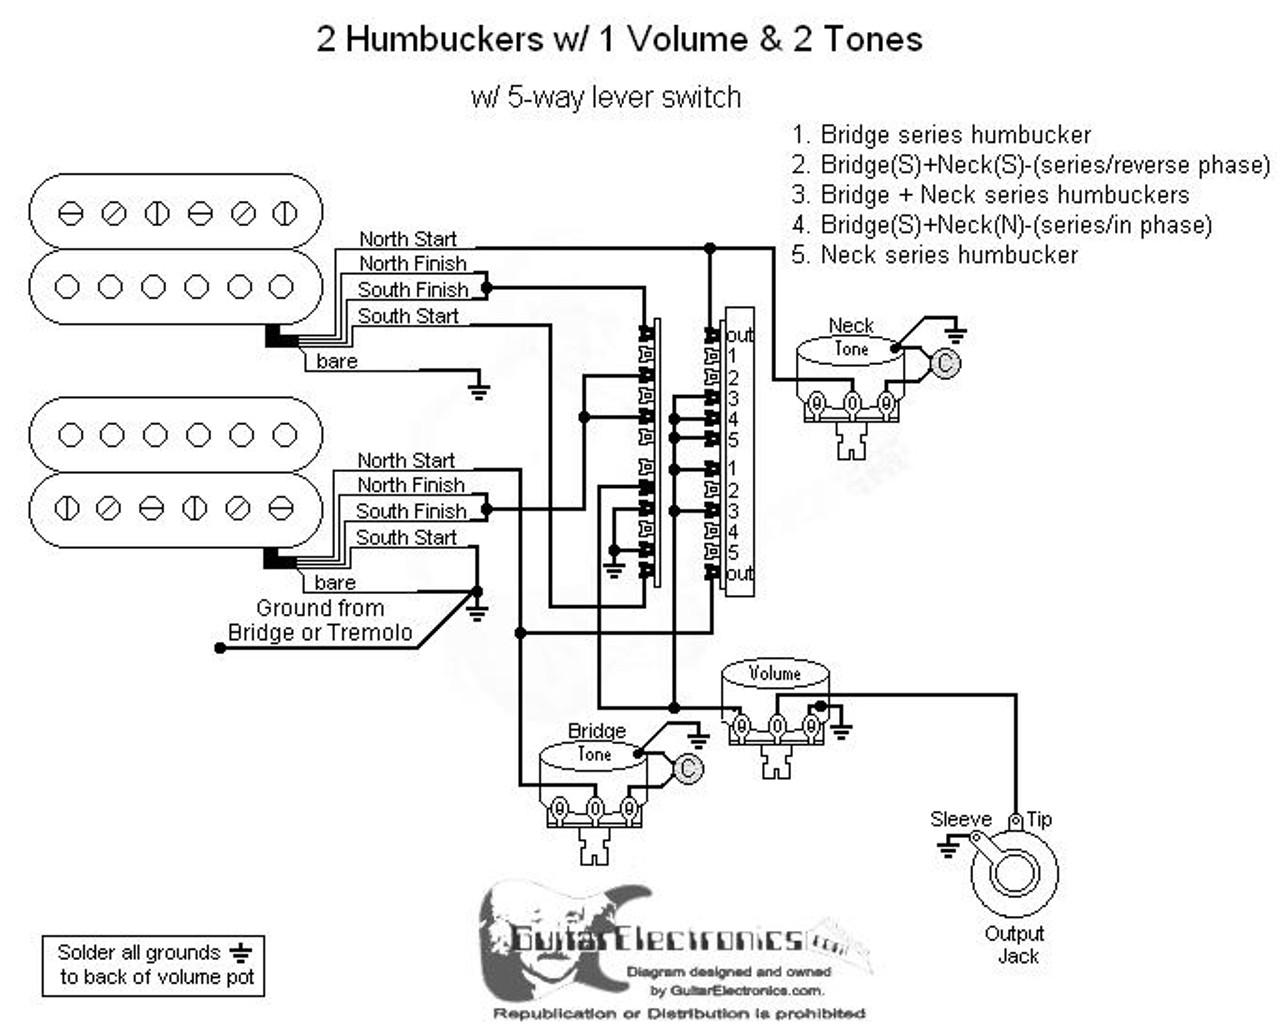 medium resolution of guitar wiring diagram 2 humbuckers 1 volume wiring diagrams terms2 humbuckers 5 way lever switch 1